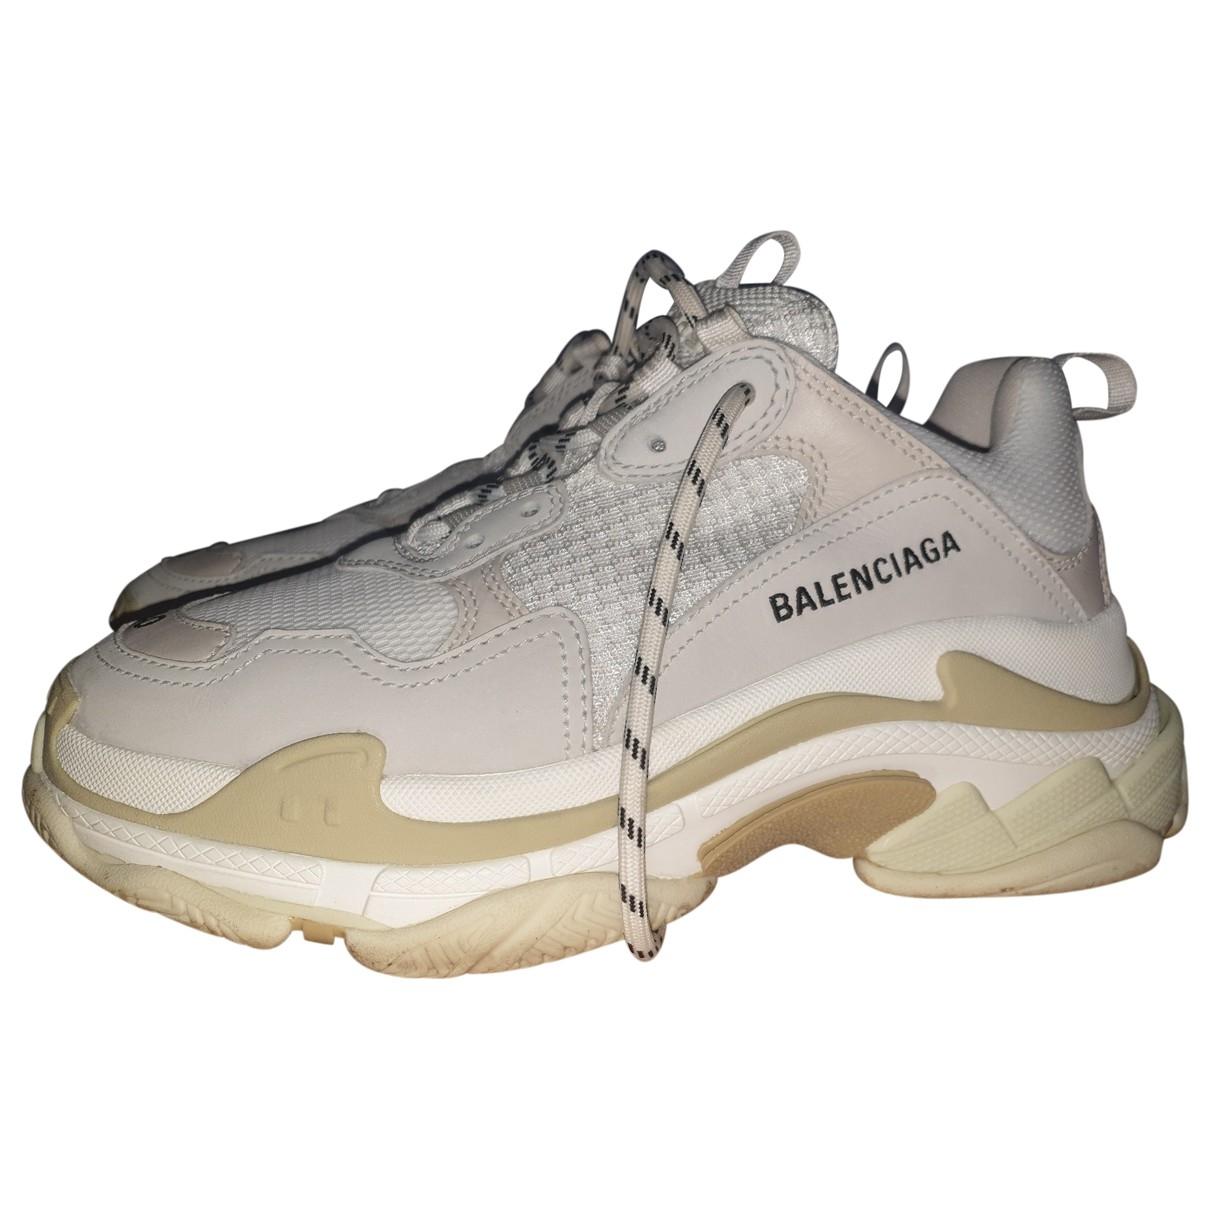 Balenciaga - Baskets Triple S pour femme en cuir - ecru